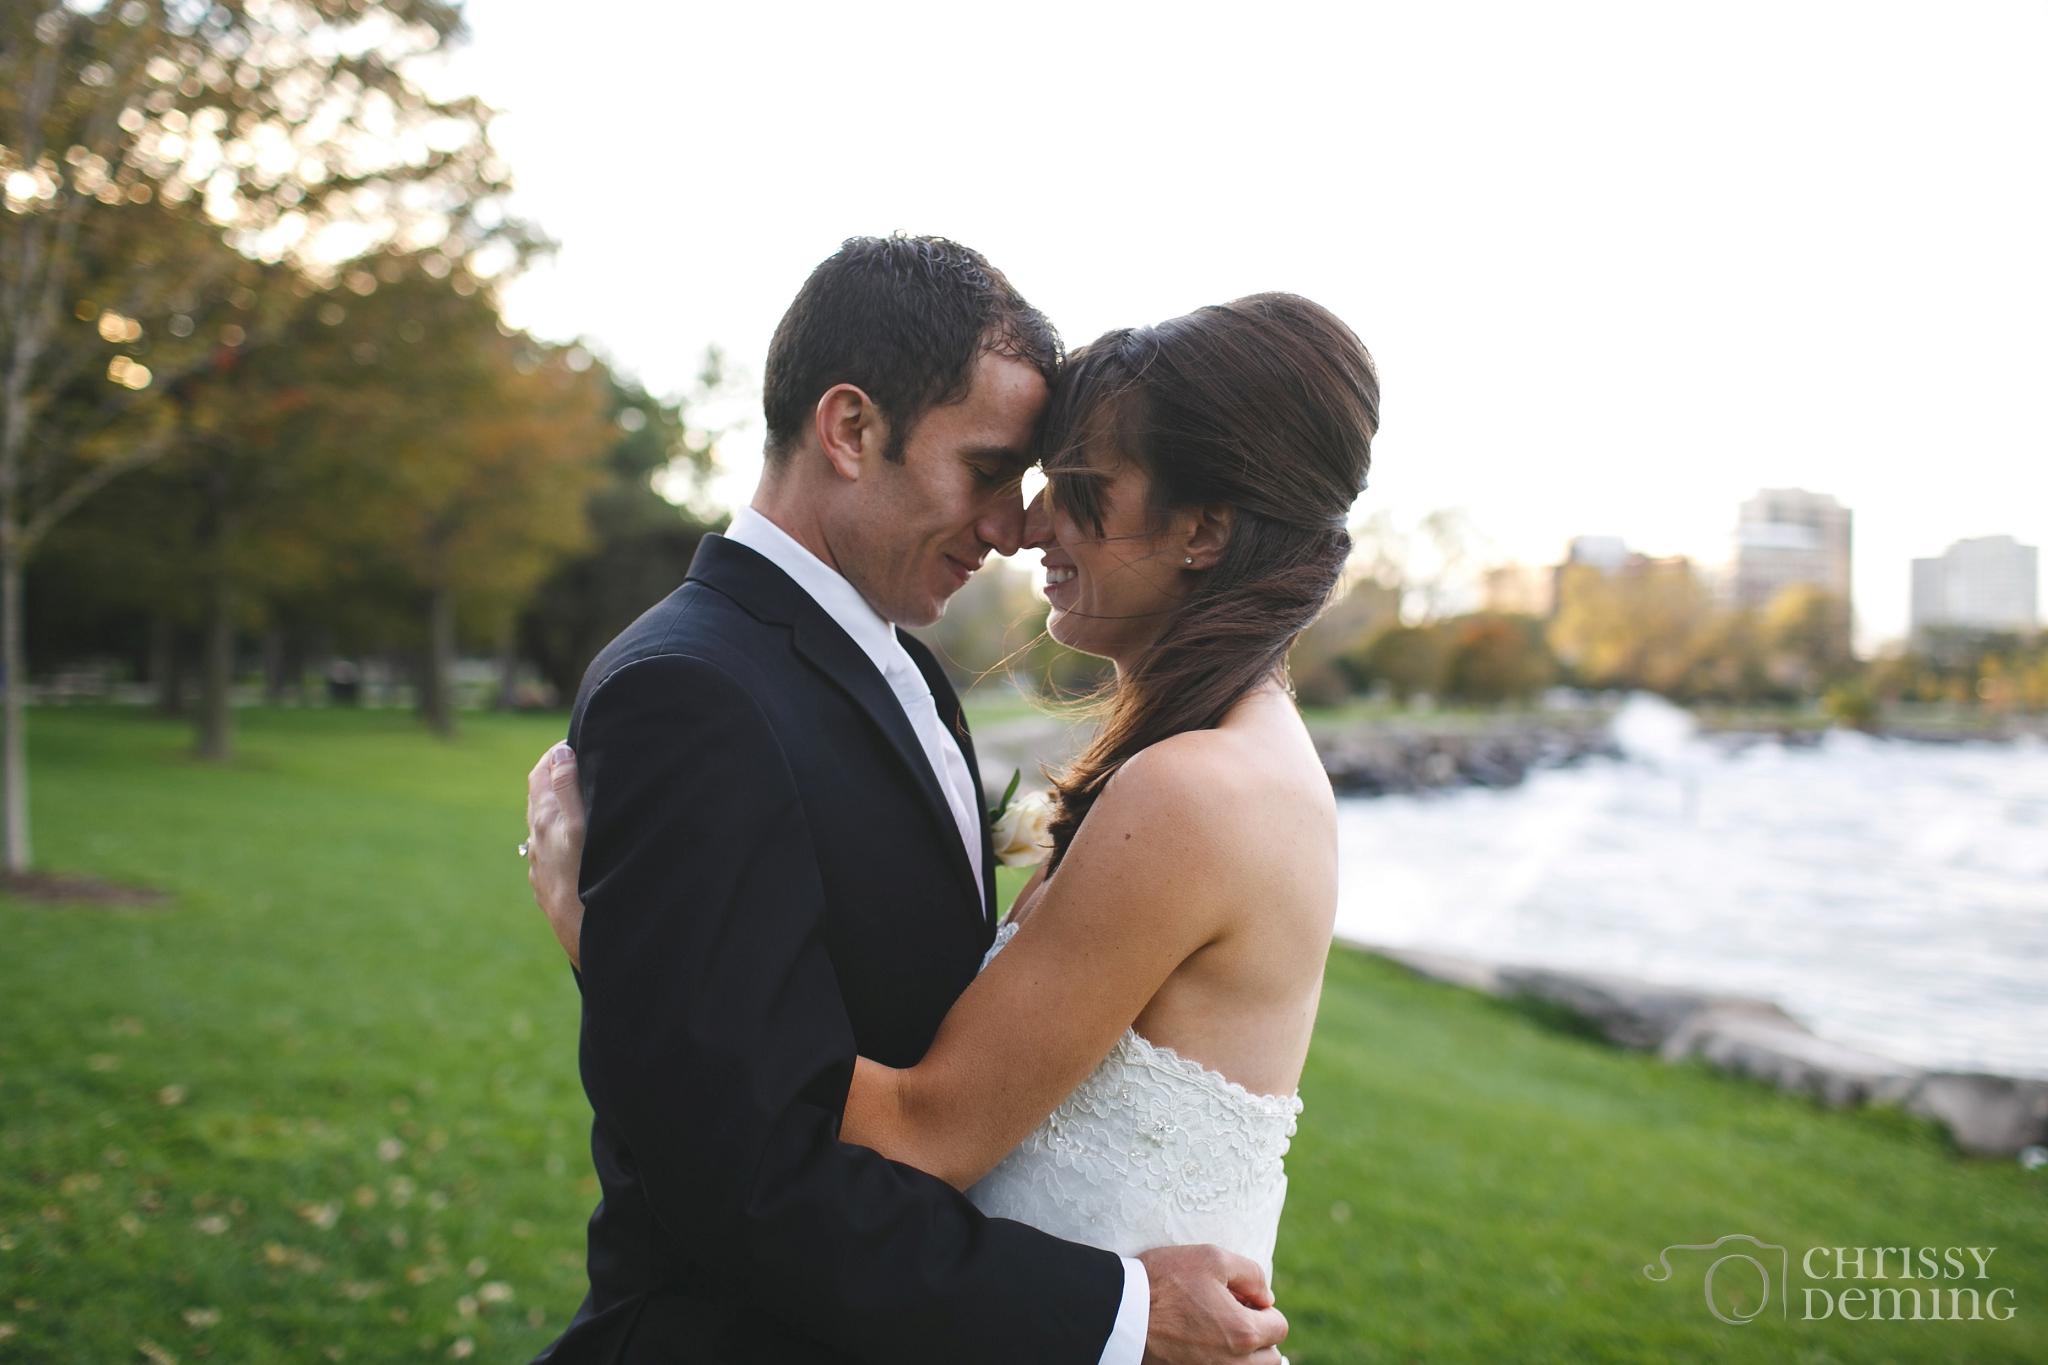 promontory_point_chicago_wedding_photography_0025.jpg